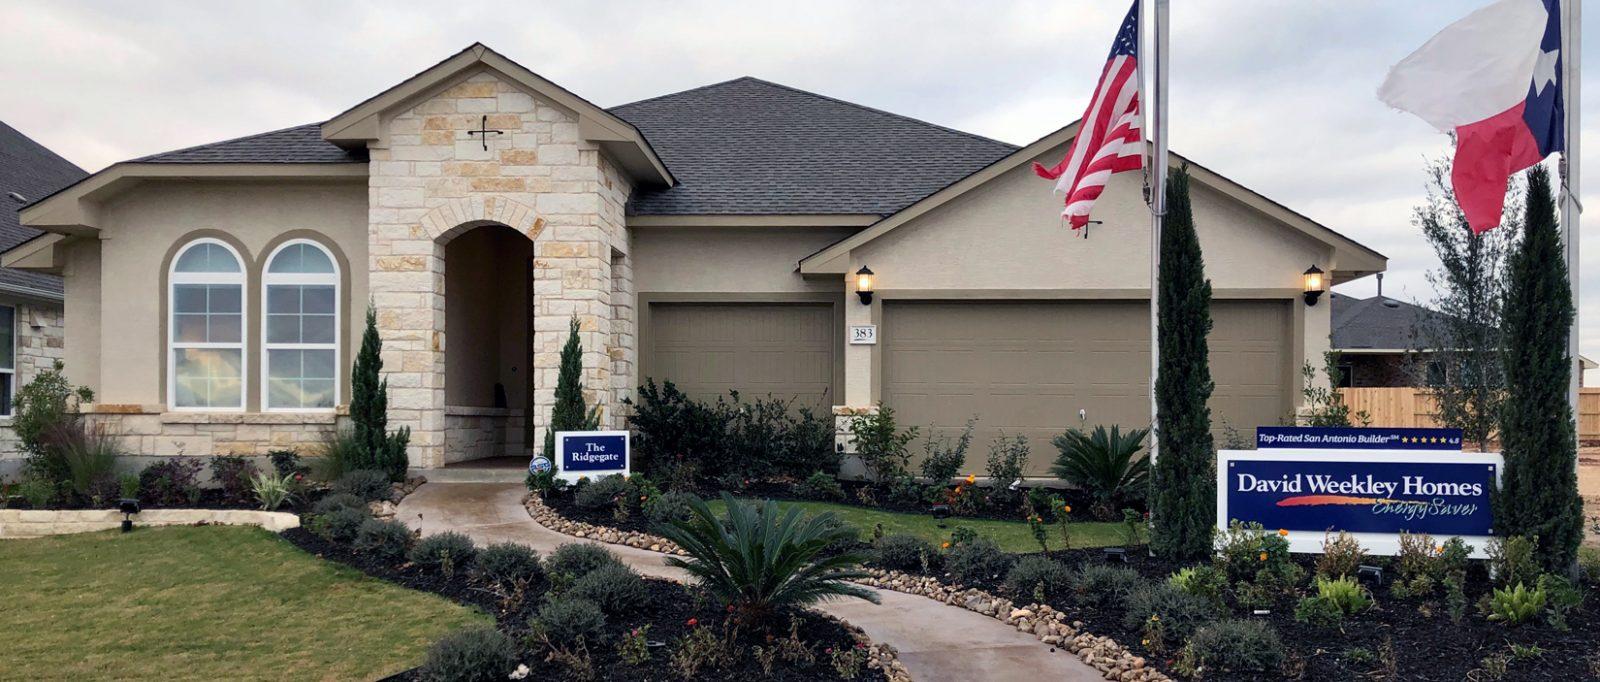 David Weekley Homes in New Braunfels, TX   Veramendi